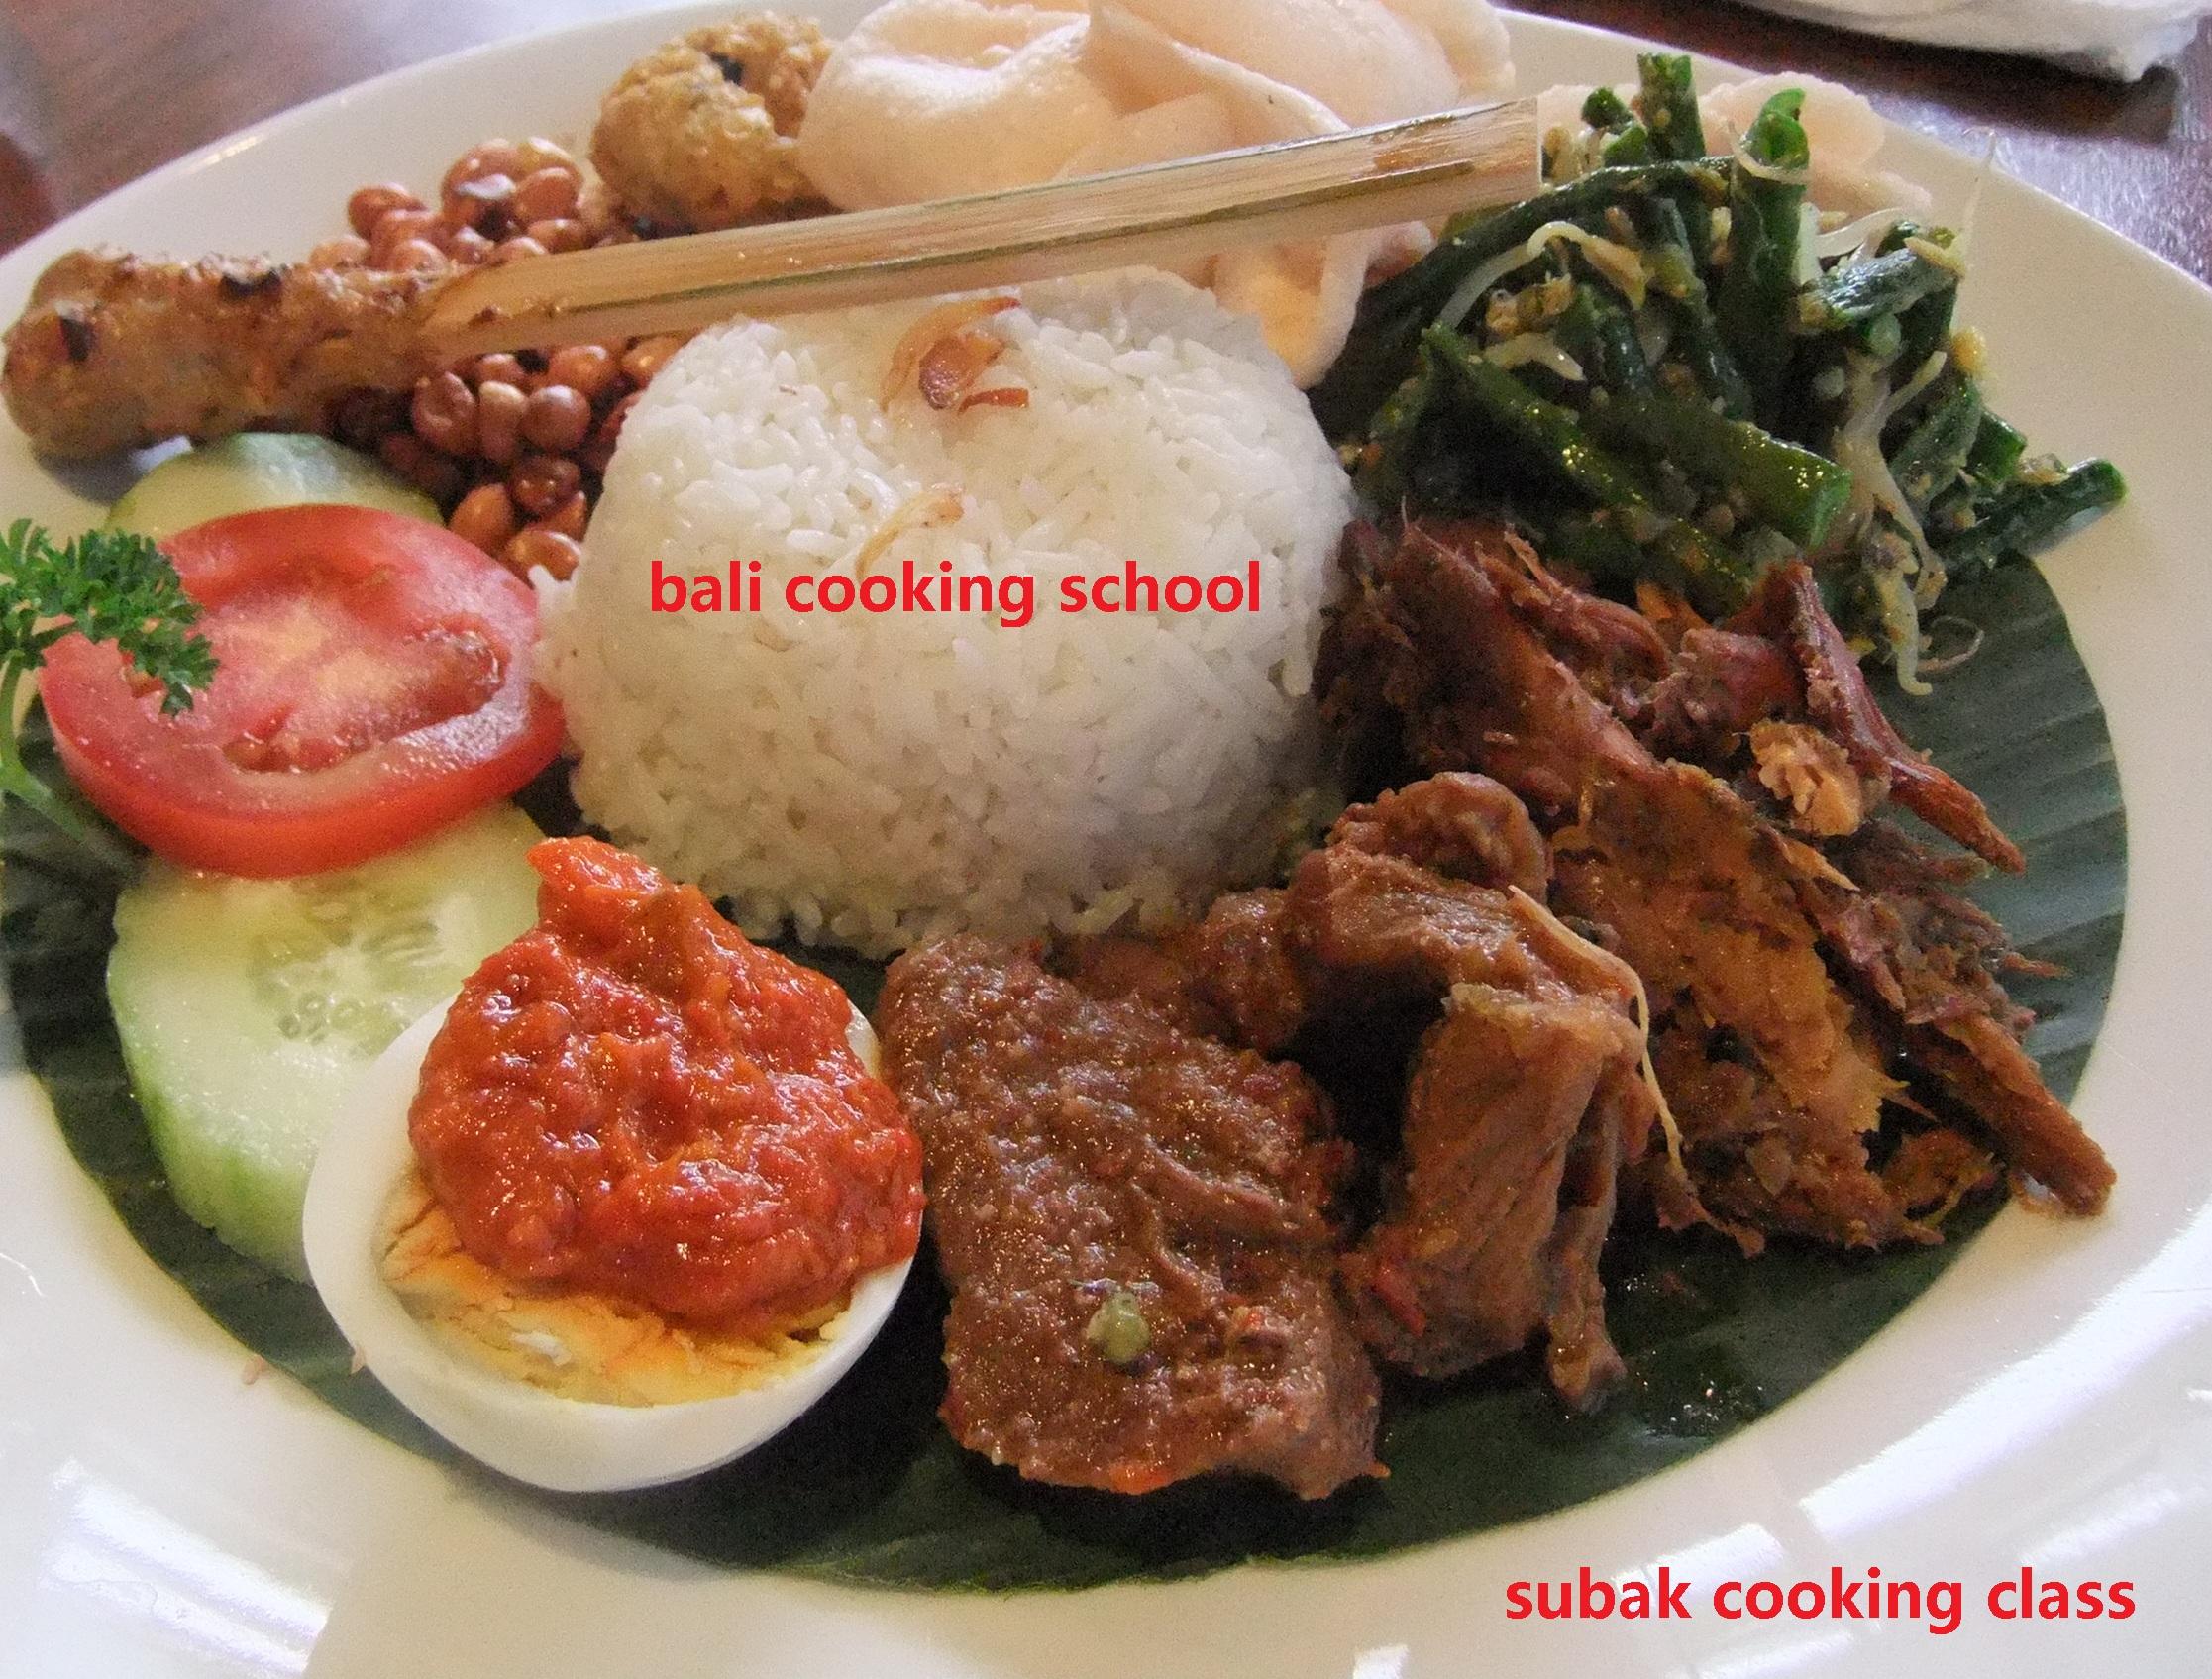 nasi campur subak cooking class.jpg1.JPG